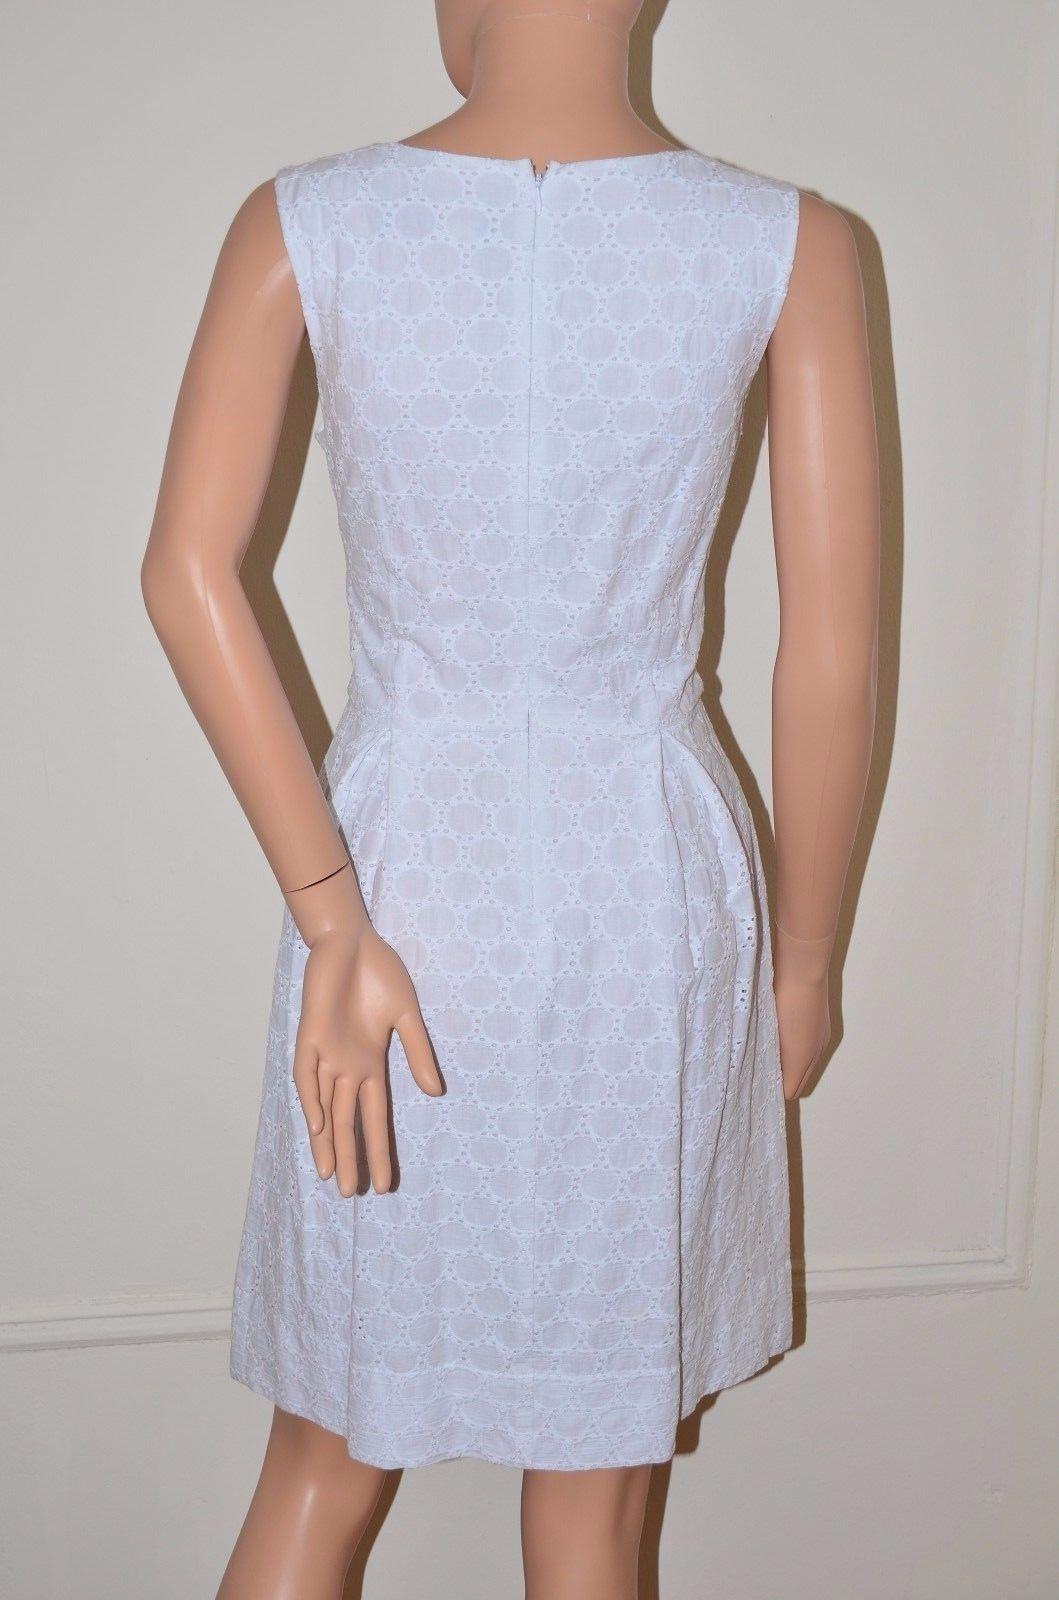 Miss Sixty M60 $128 Eyelet Embroidered Dress White size 6 Medium M NEW